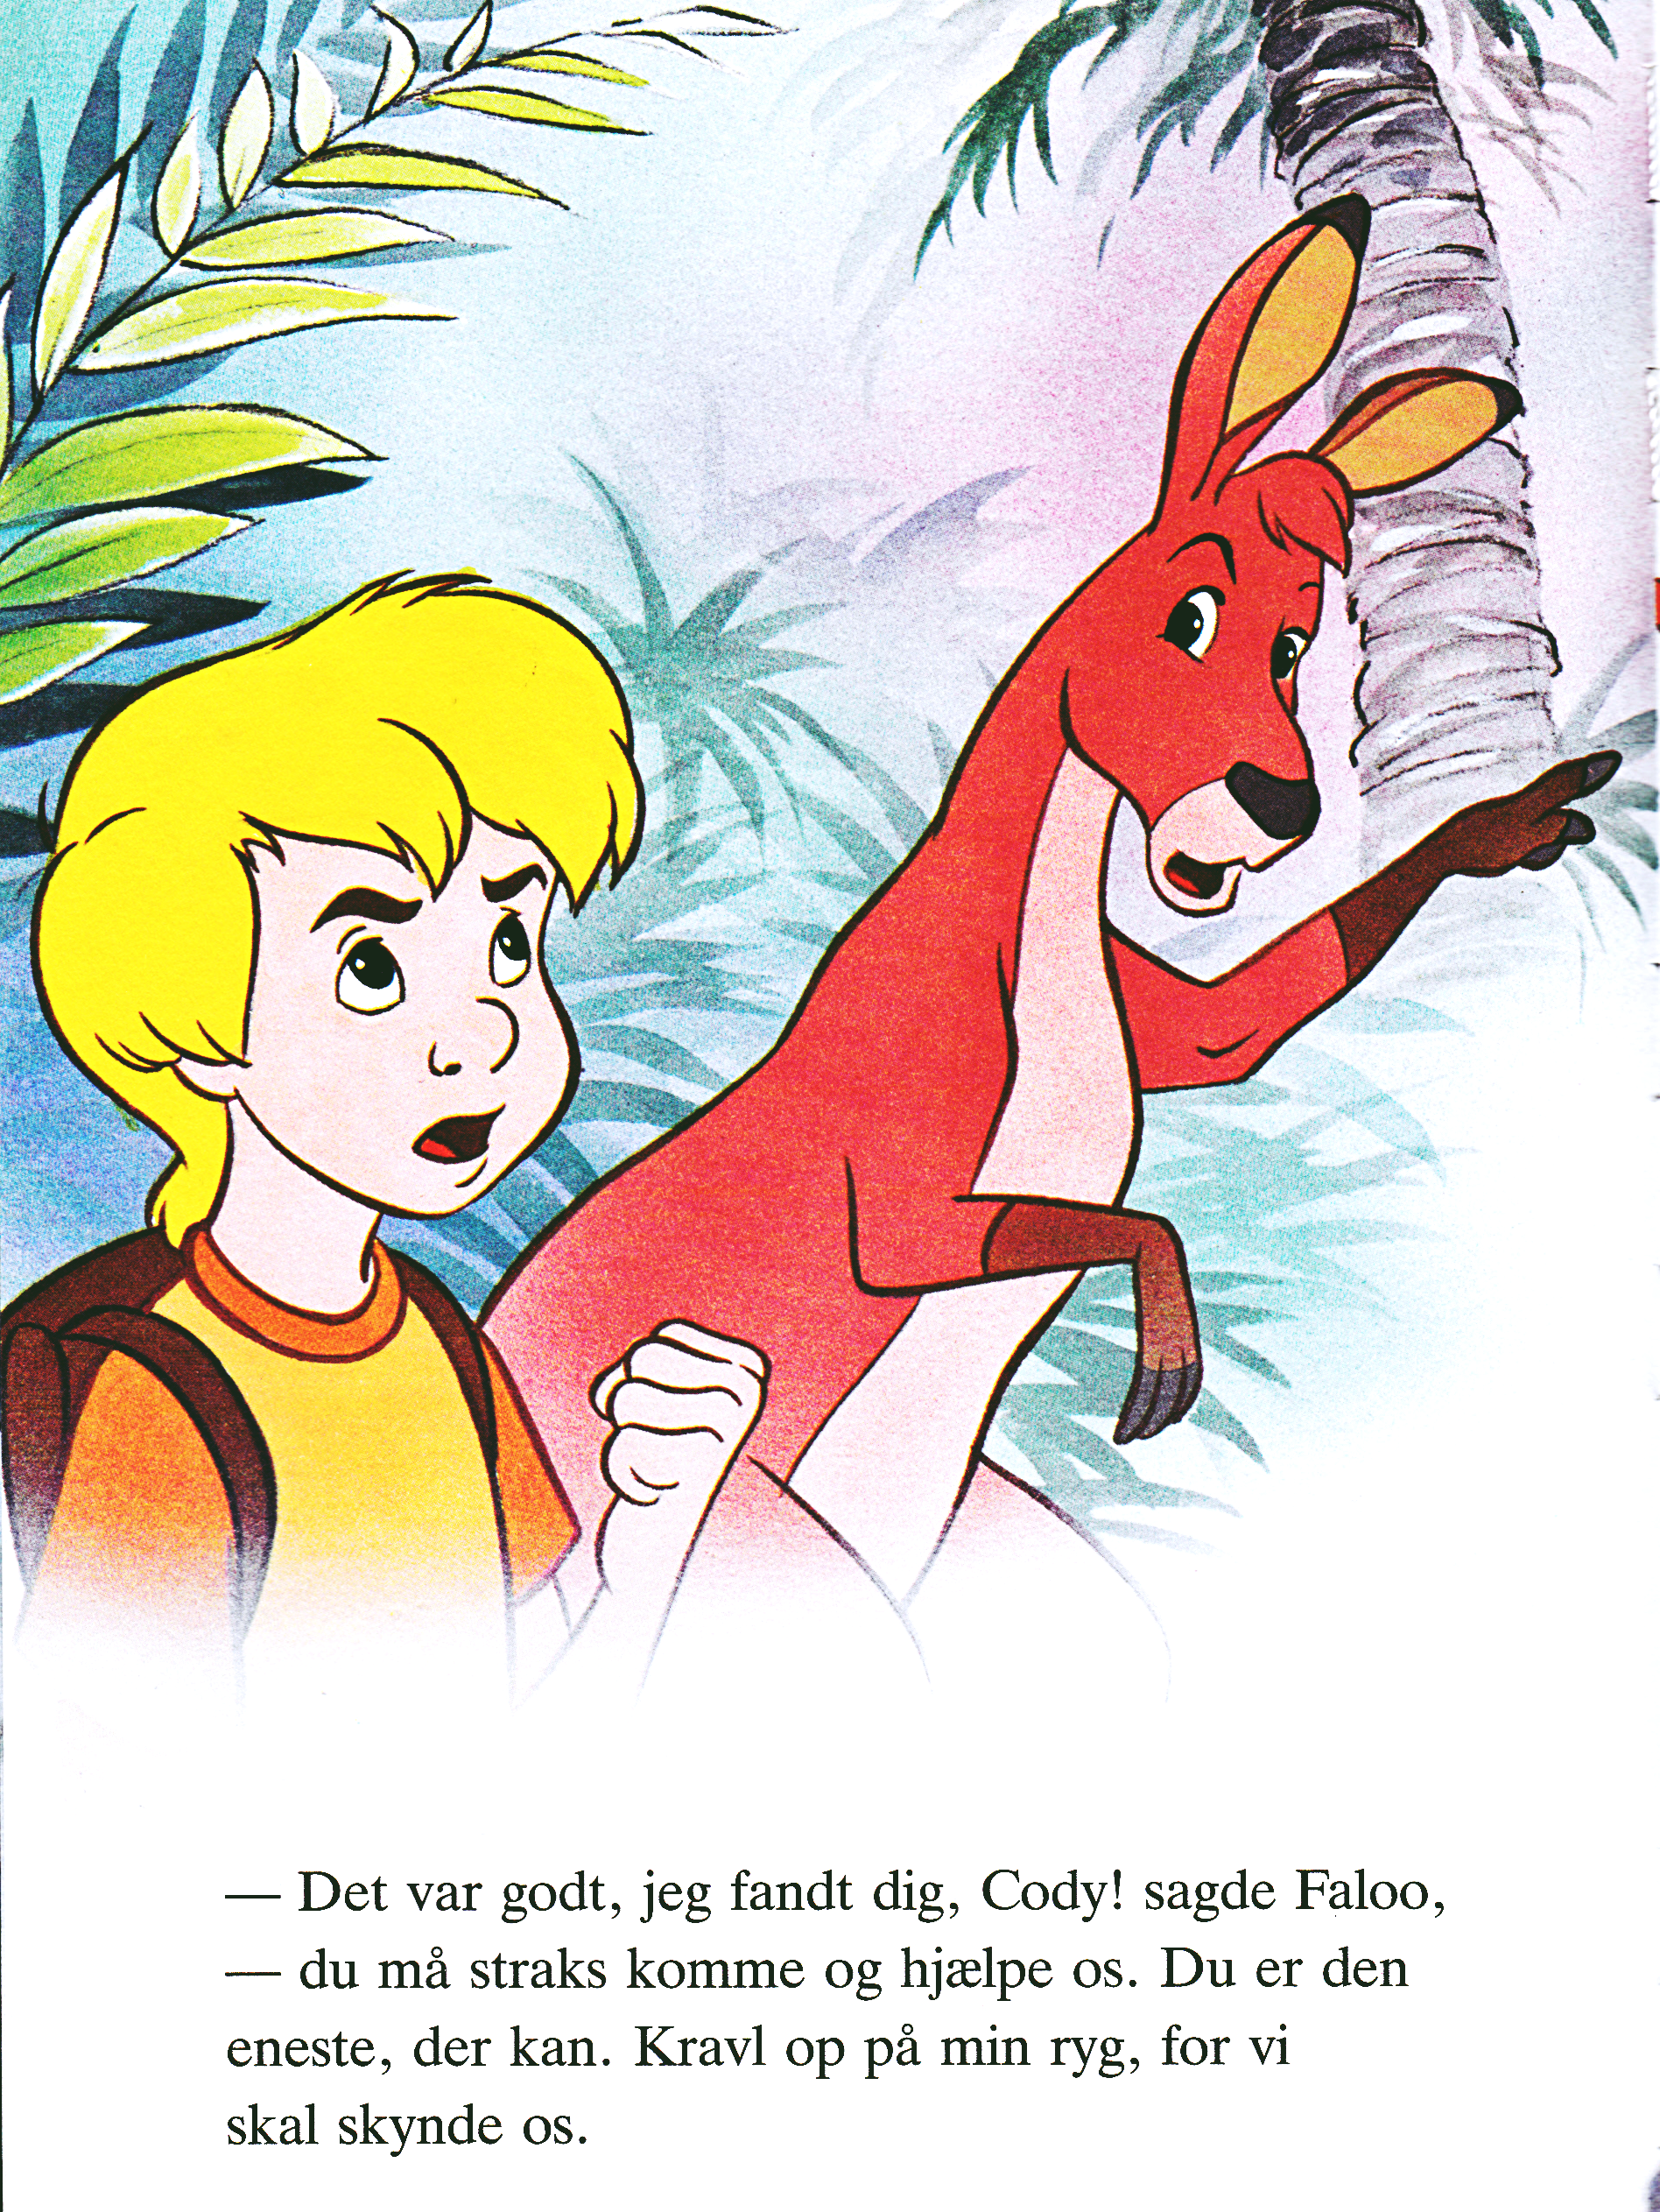 Walt Disney Book Images - Cody & Faloo